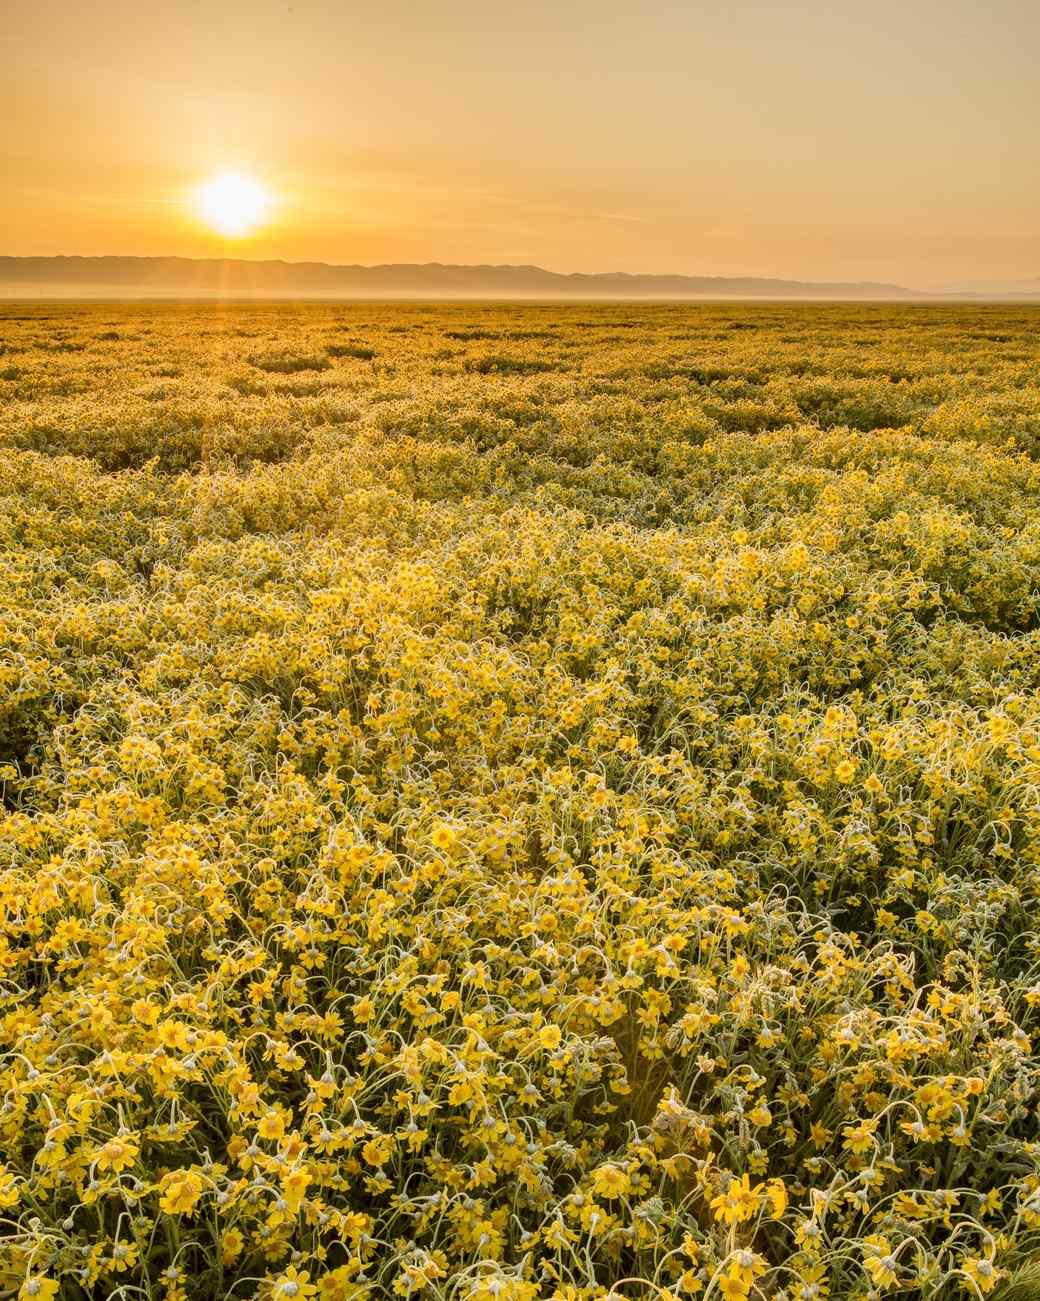 Carrizo Plain National Monument in California